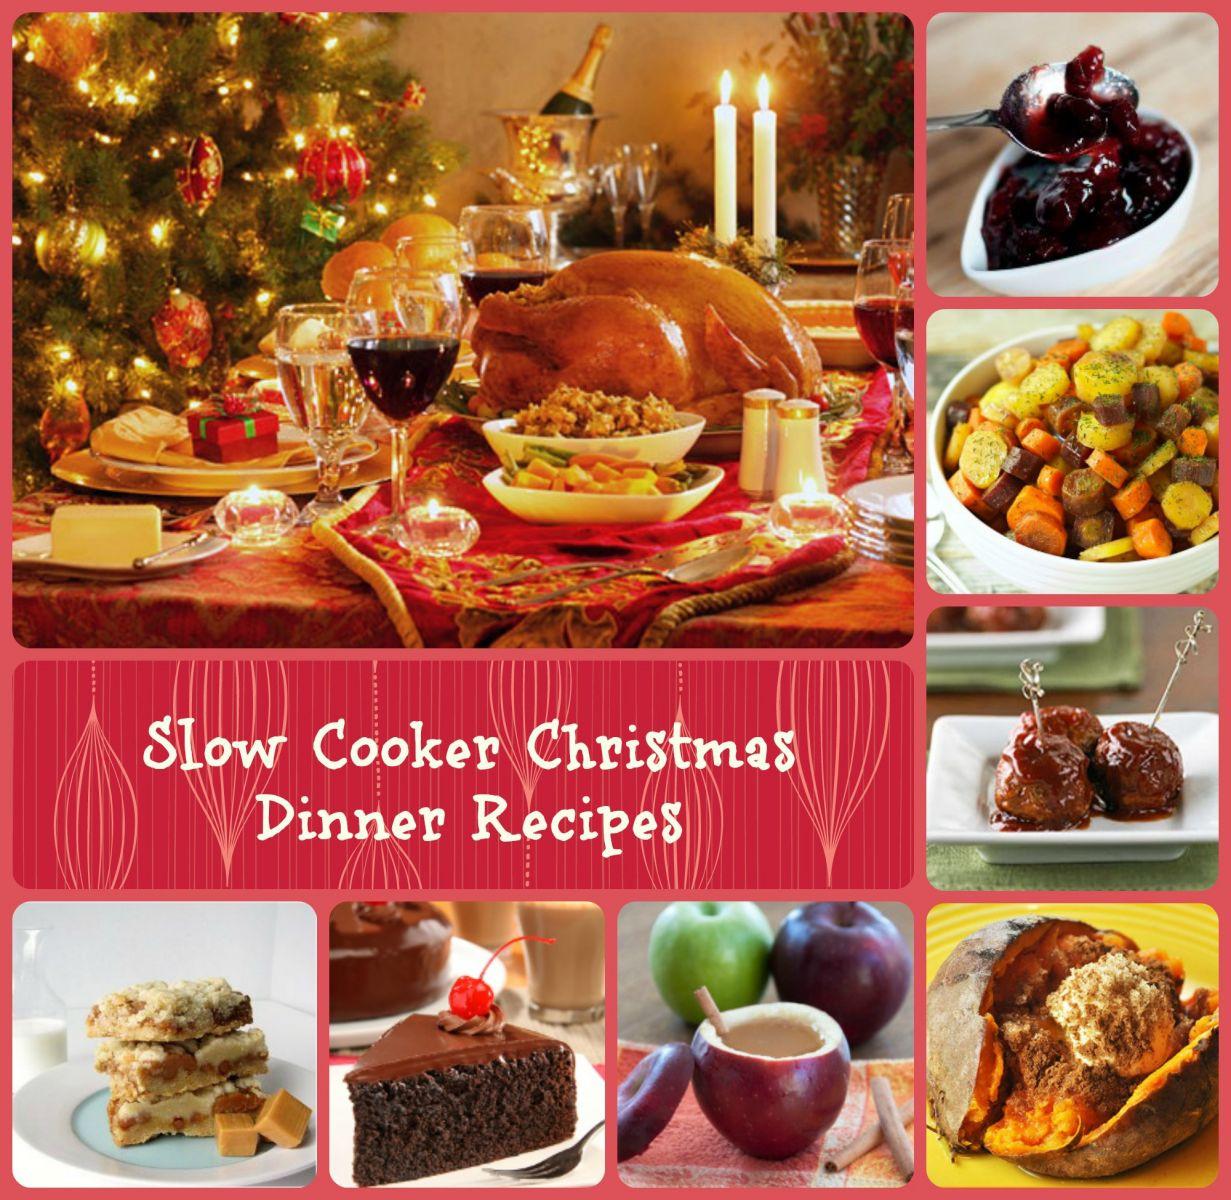 Recipe For Christmas Dinner  45 Recipes for Christmas Dinner Plus Bonus Free eCookbook